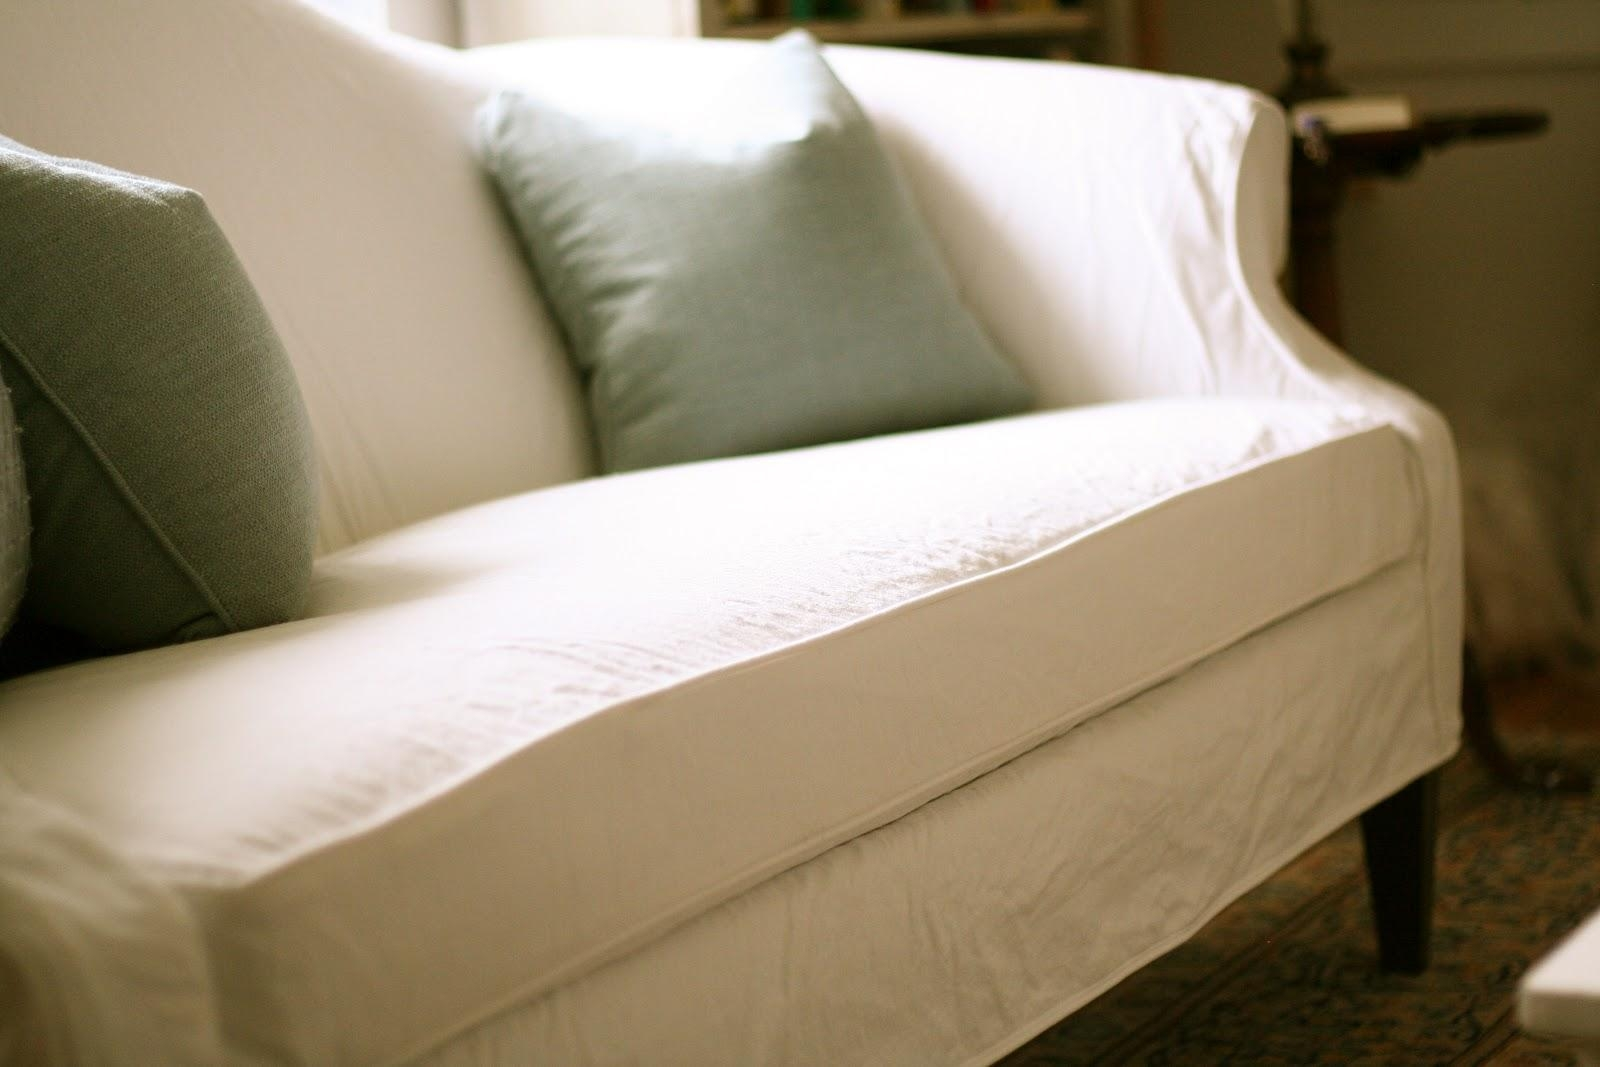 Custom Slipcoversshelley: White Camel Back Couch Intended For Camel Back Sofa Slipcovers (Image 7 of 20)